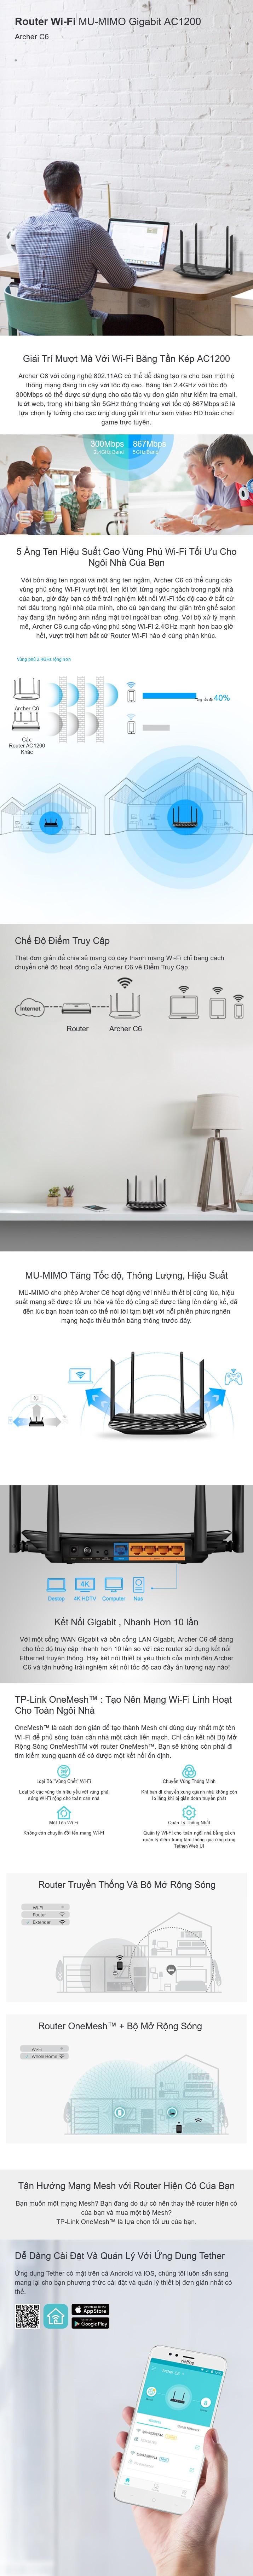 Bộ phát WIFI Router TP-Link Archer C6 Băng Tần Kép AC1200